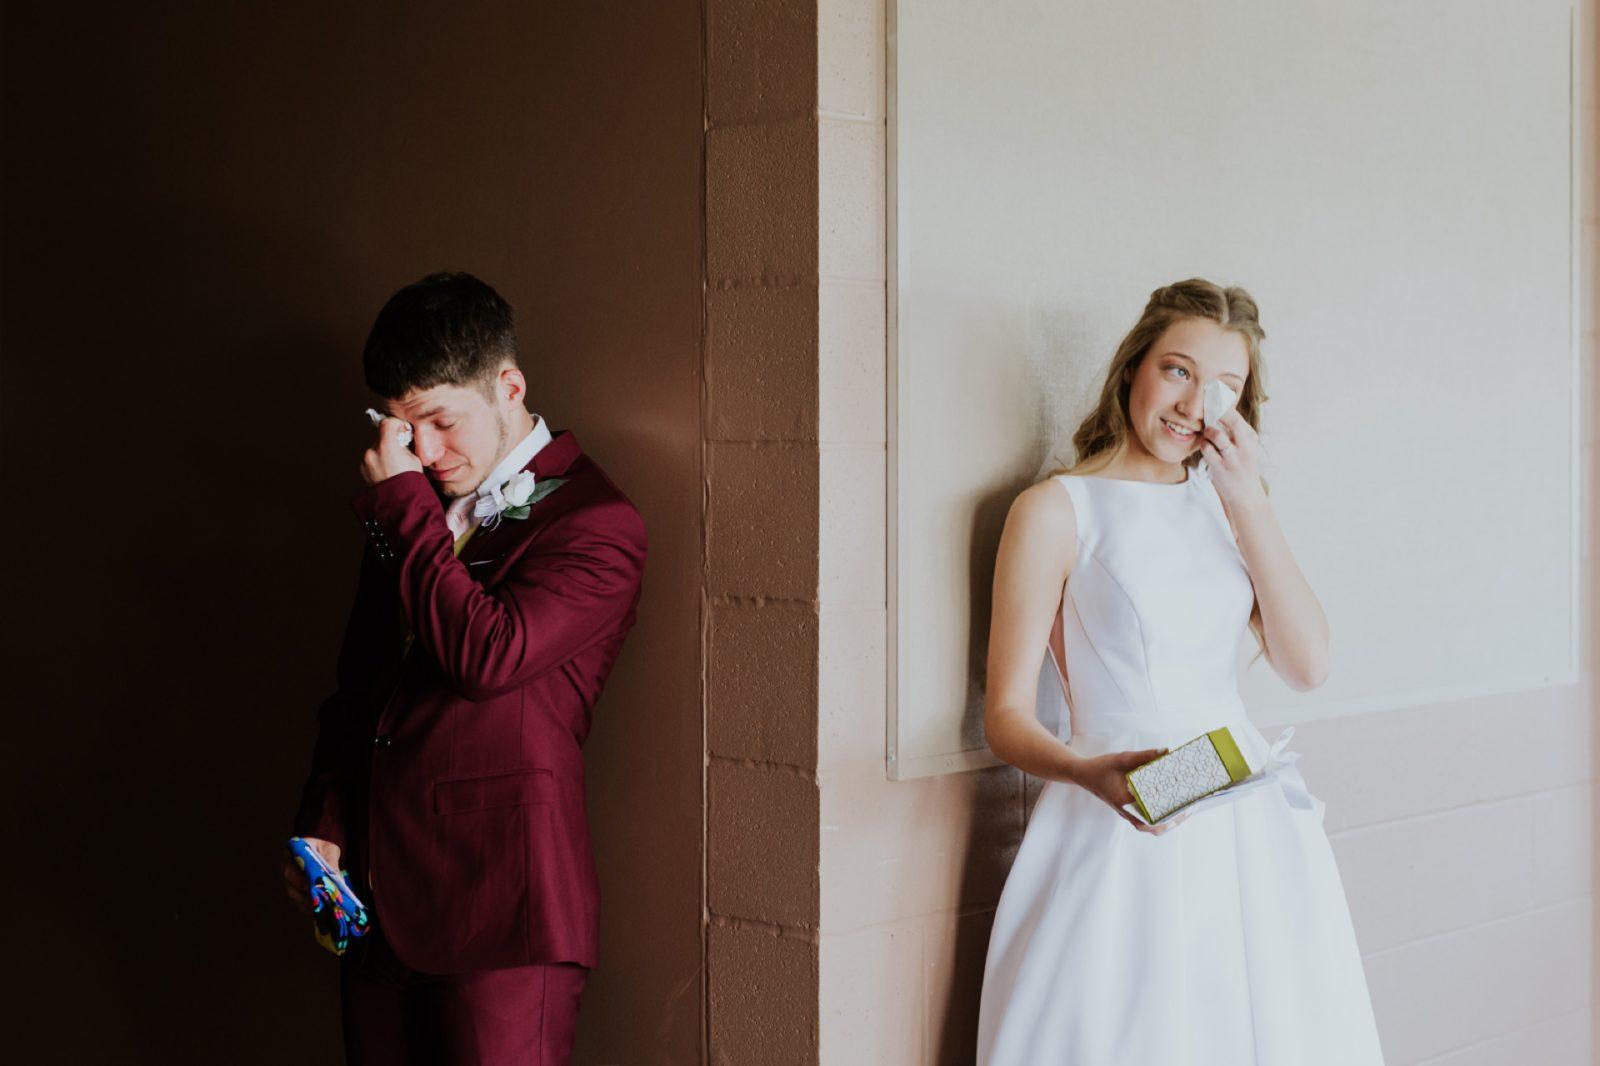 East-Central-Indiana-Wedding_010-1600x1066.jpg